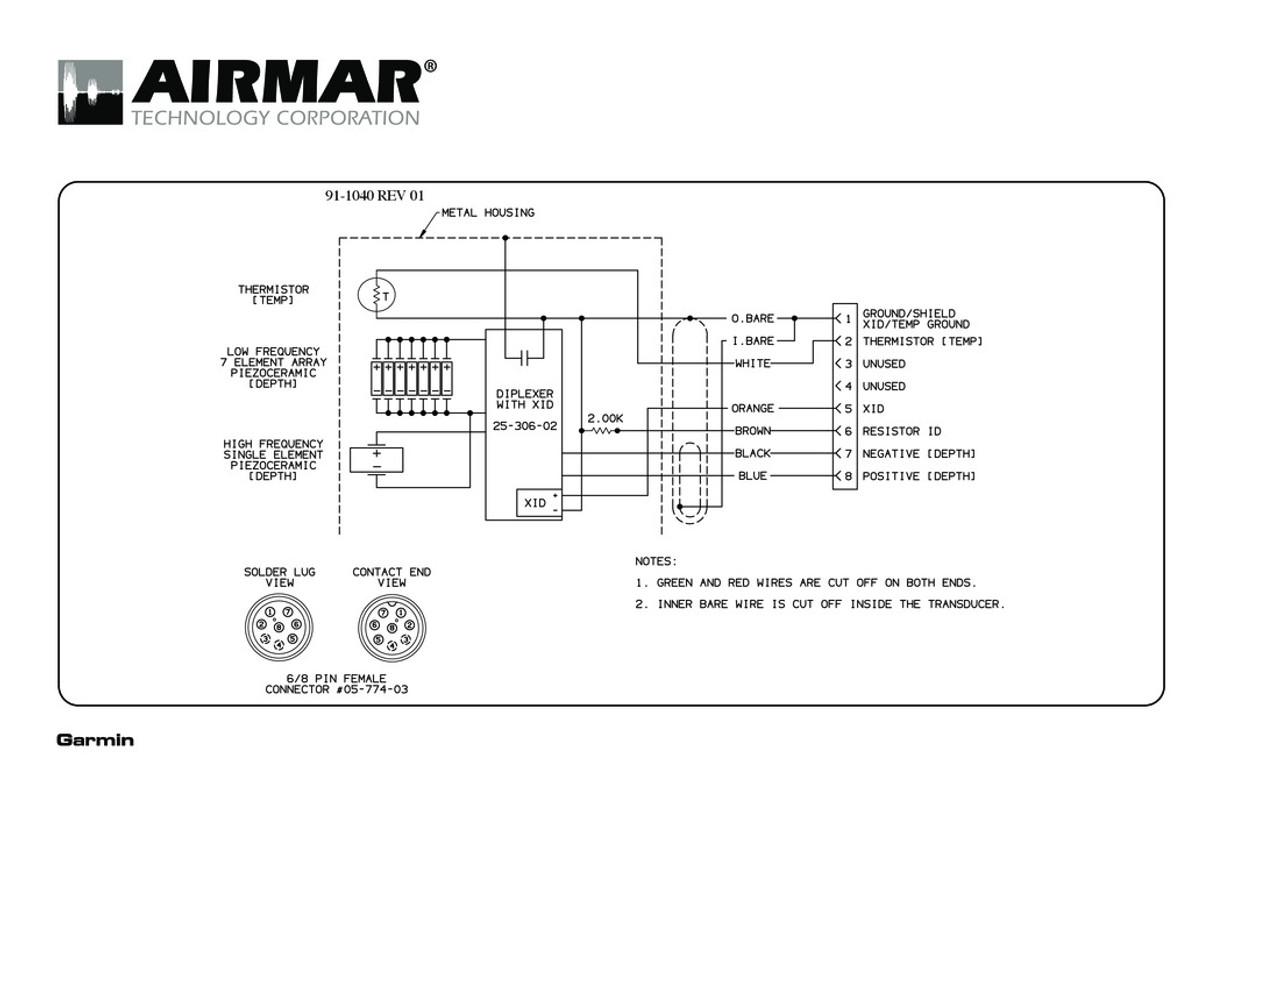 Airmar Wiring Diagram Garmin 1kw 8 pin (D,T) | Blue Bottle